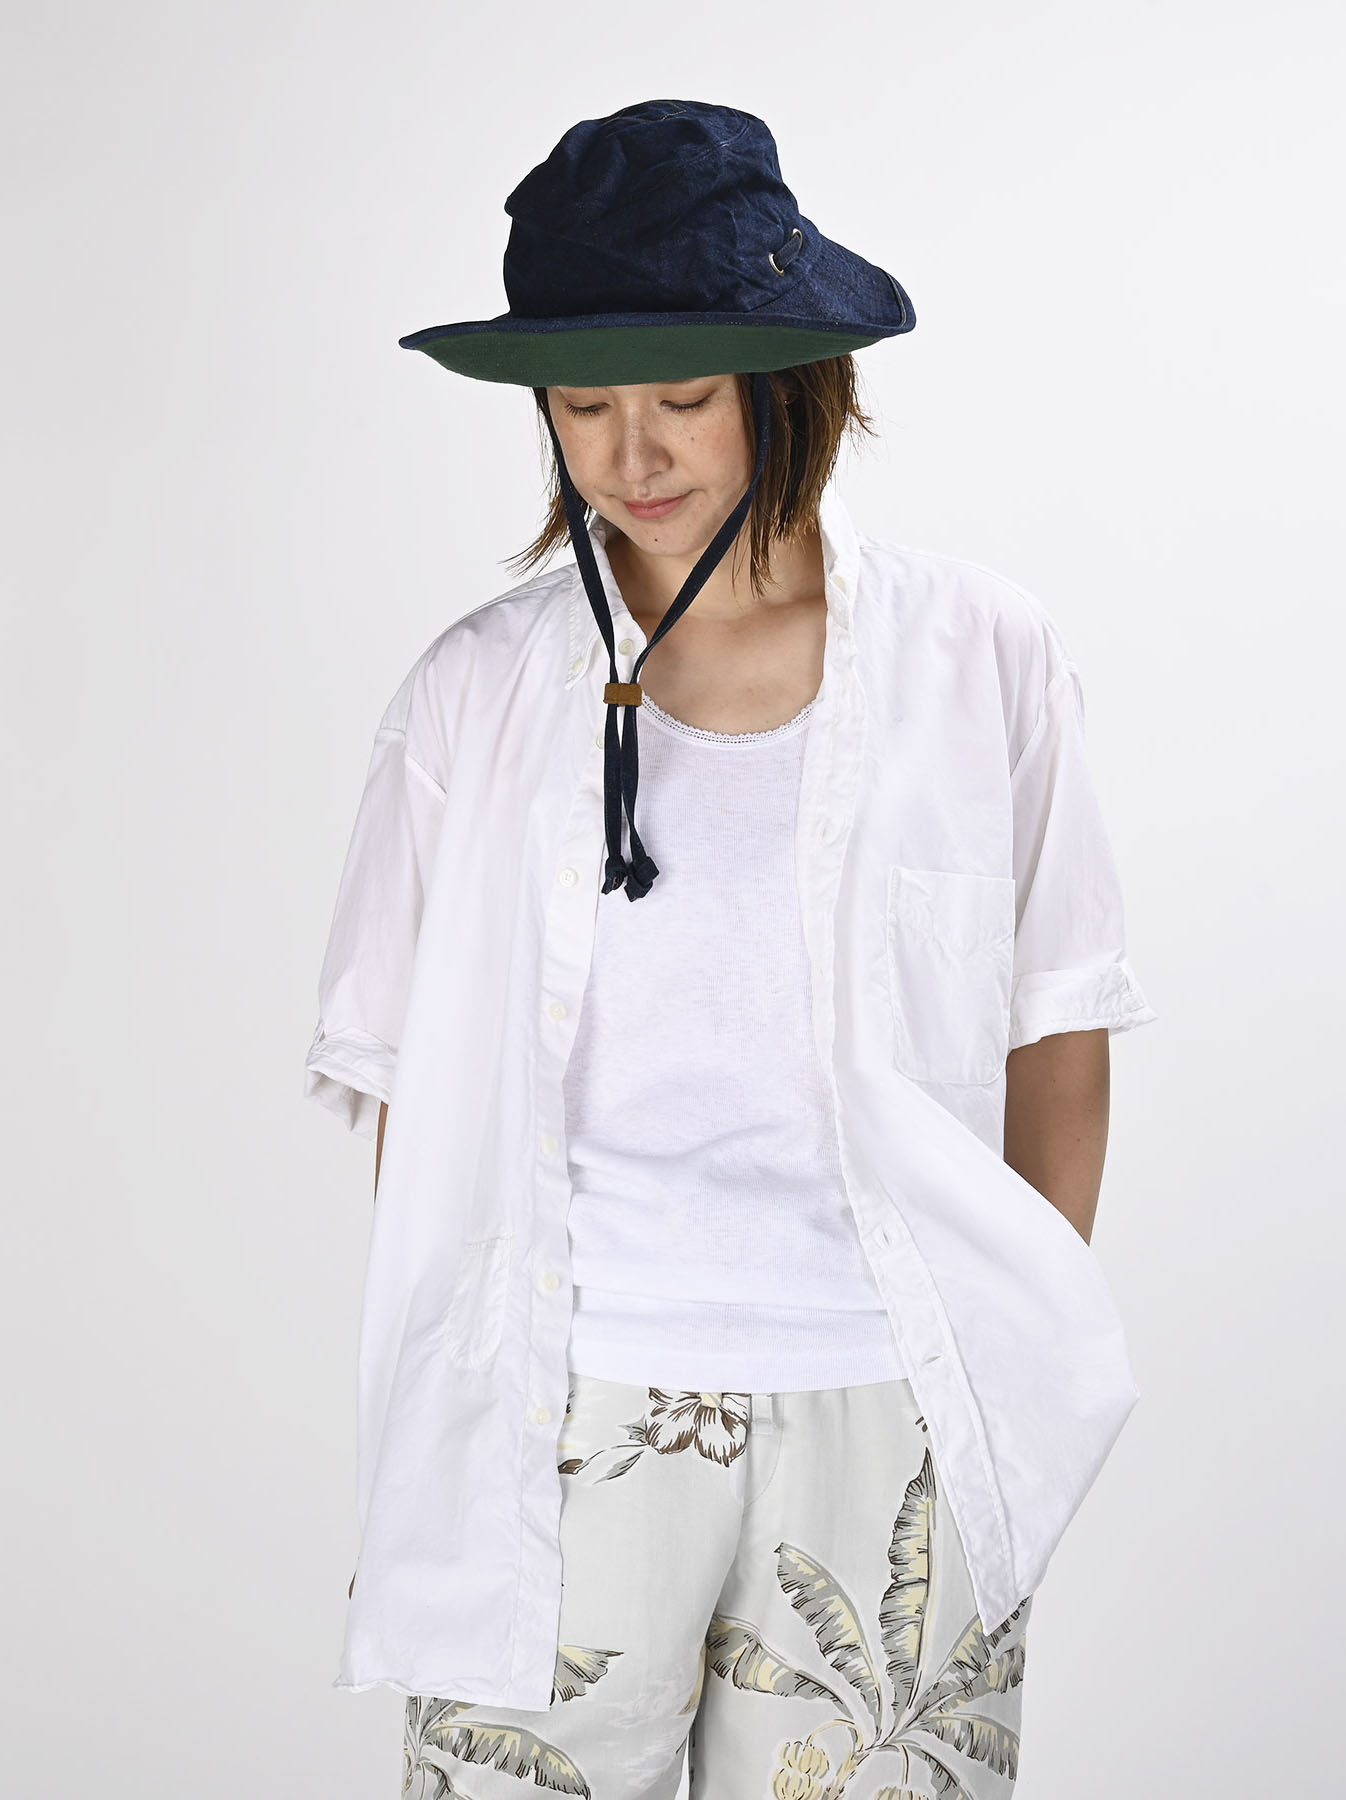 Damp Cotton Anuenue Ocean Shirt (0621)-9